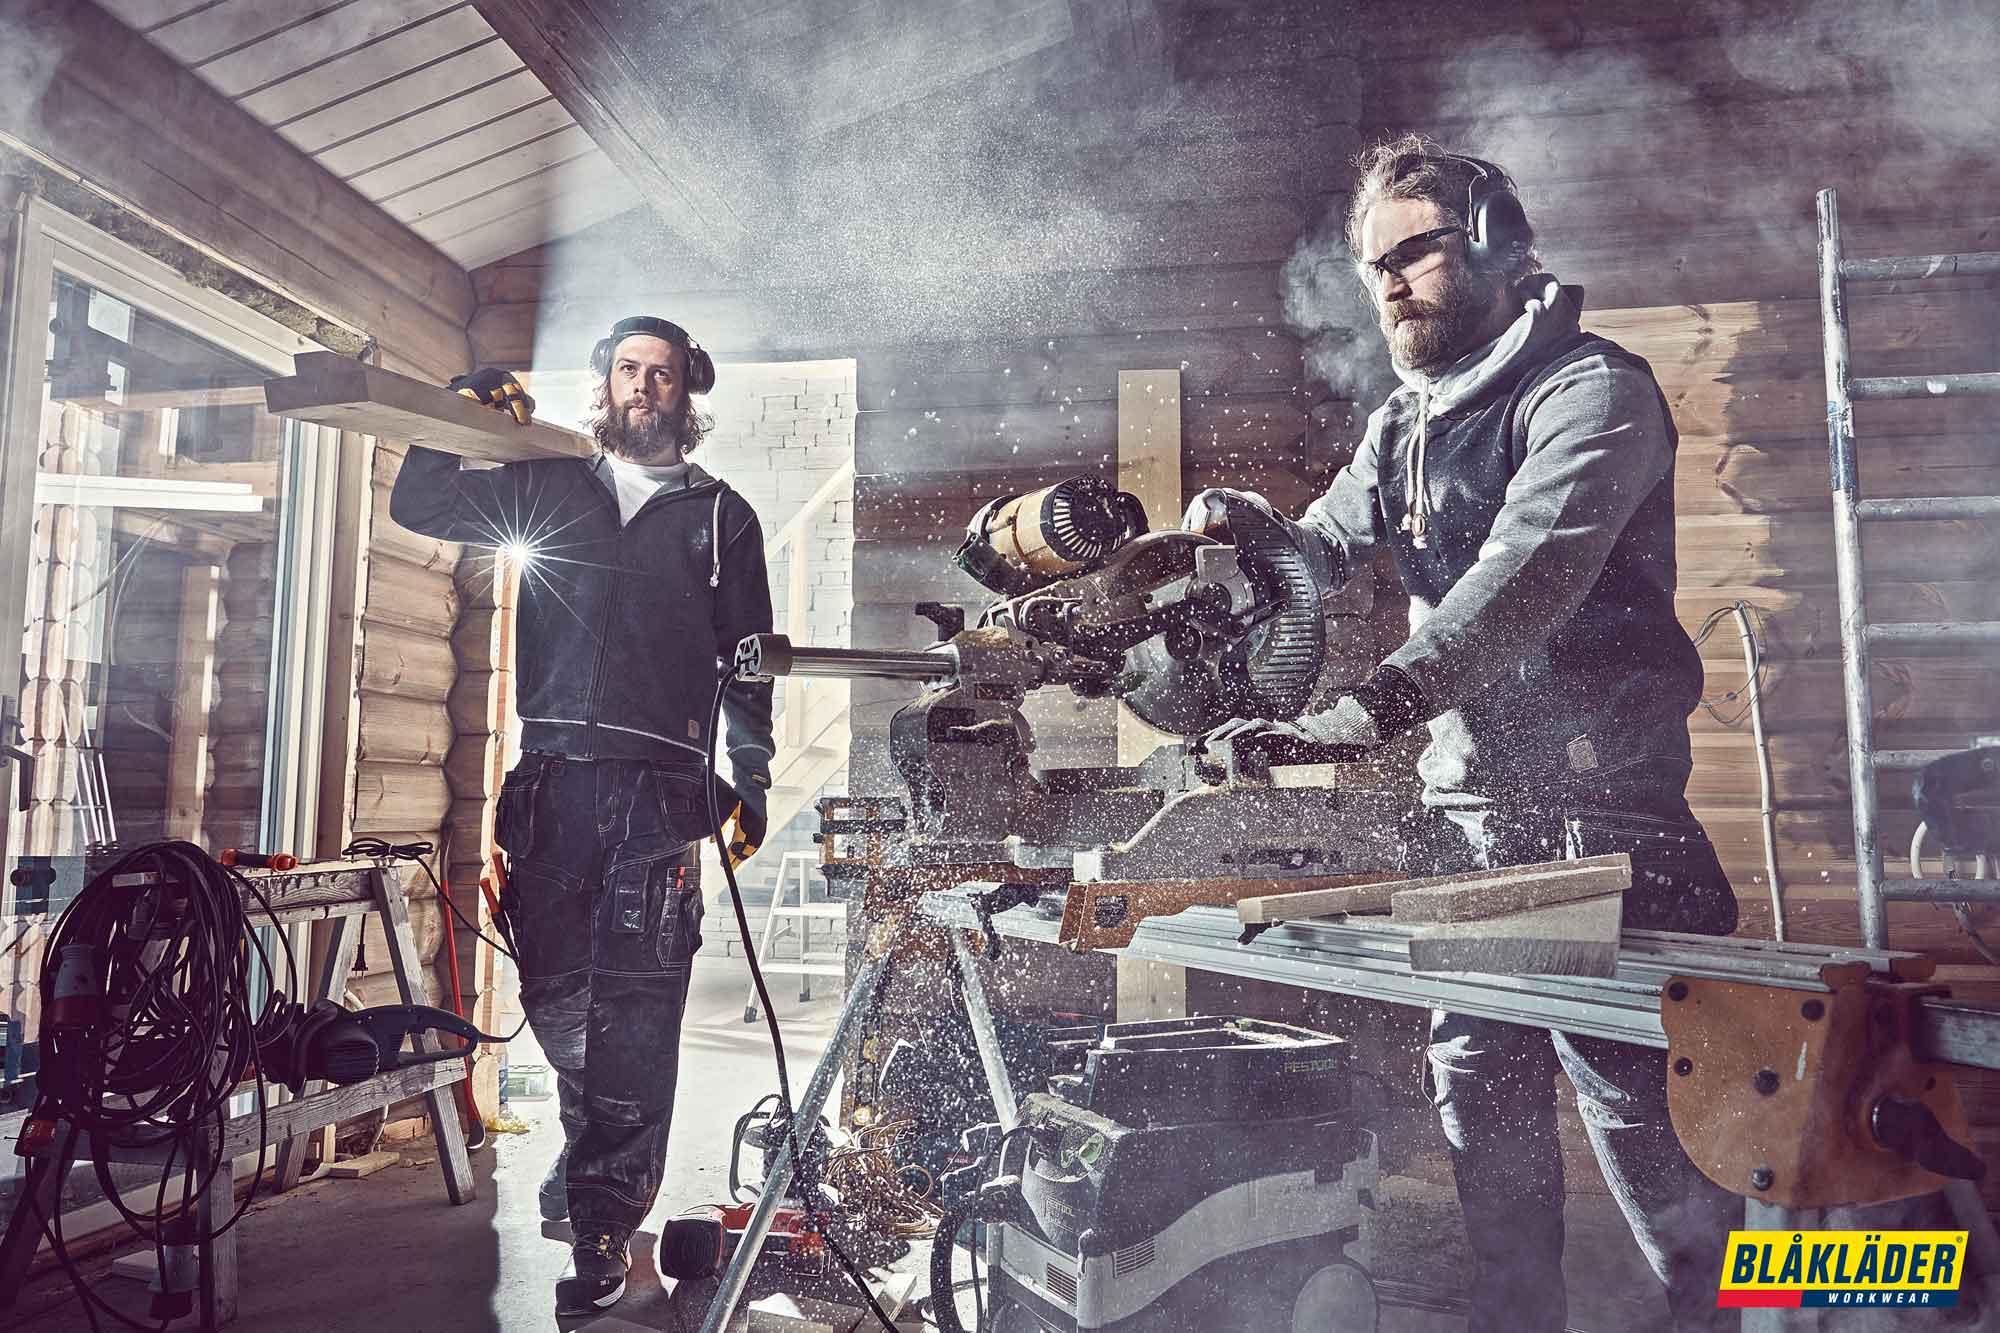 Lavoratori artigiani